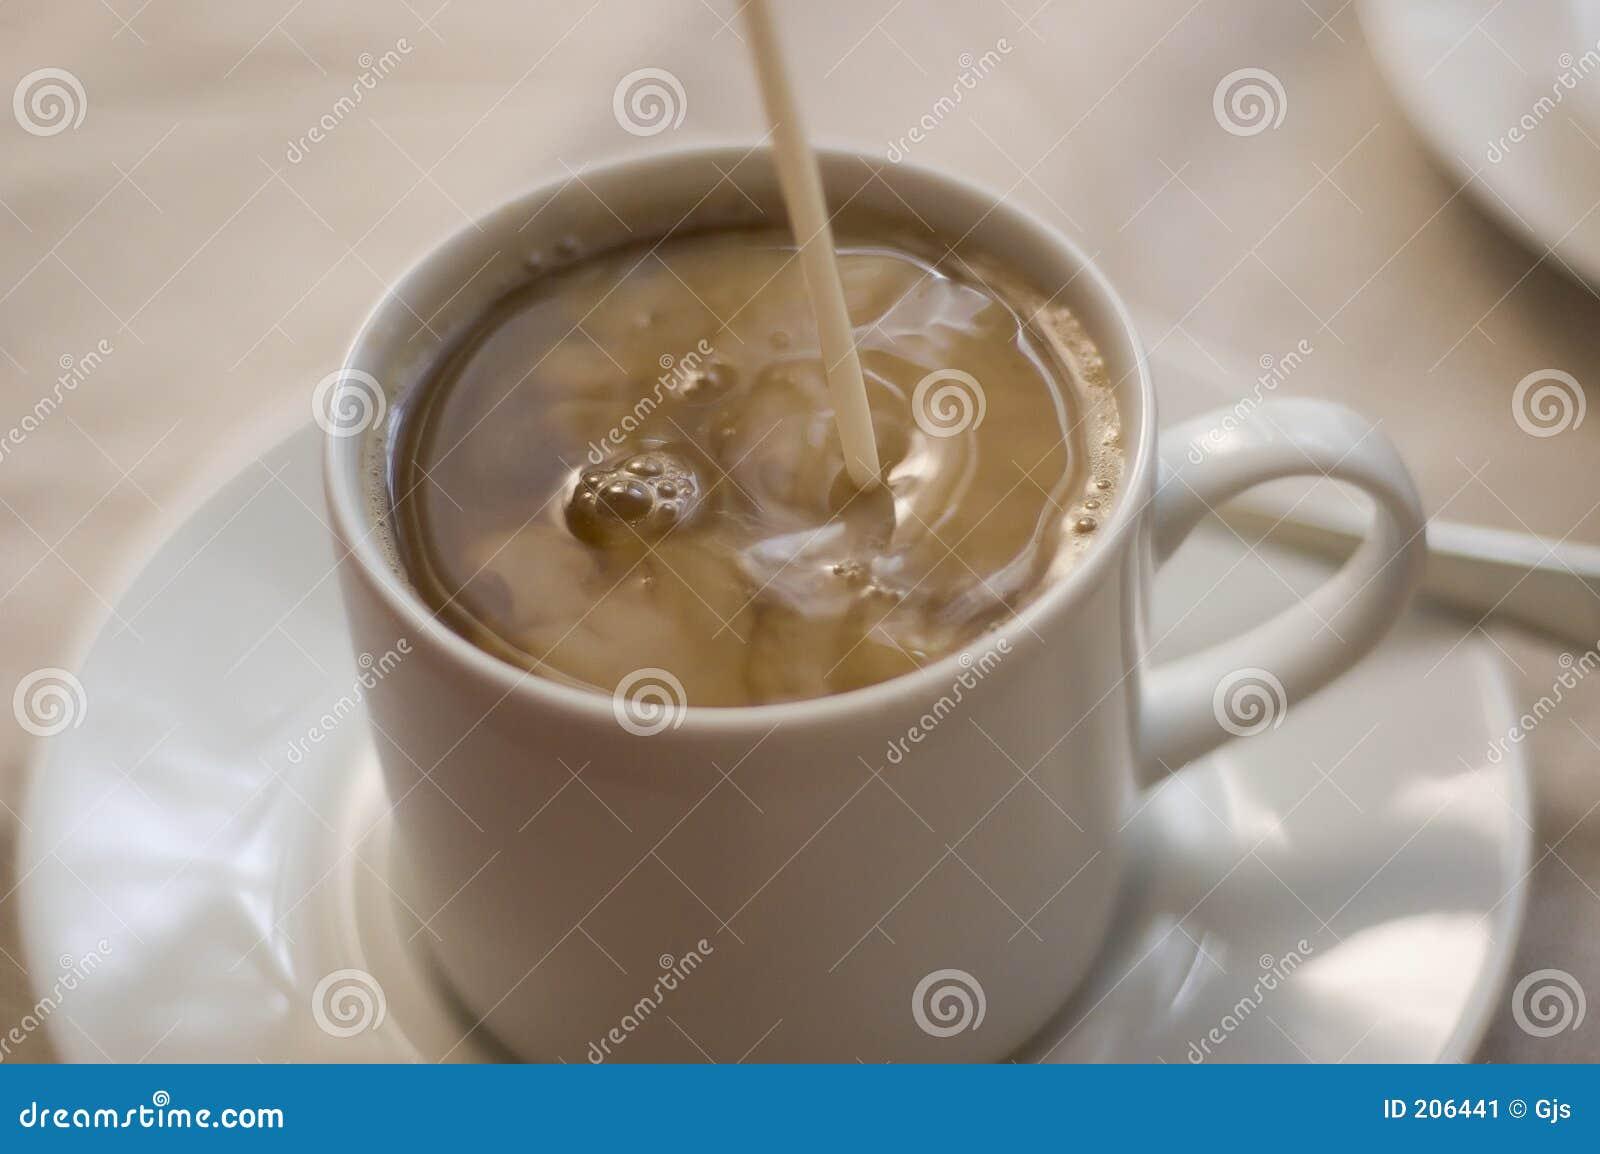 Pouring Cream Stock Image - Image: 206441